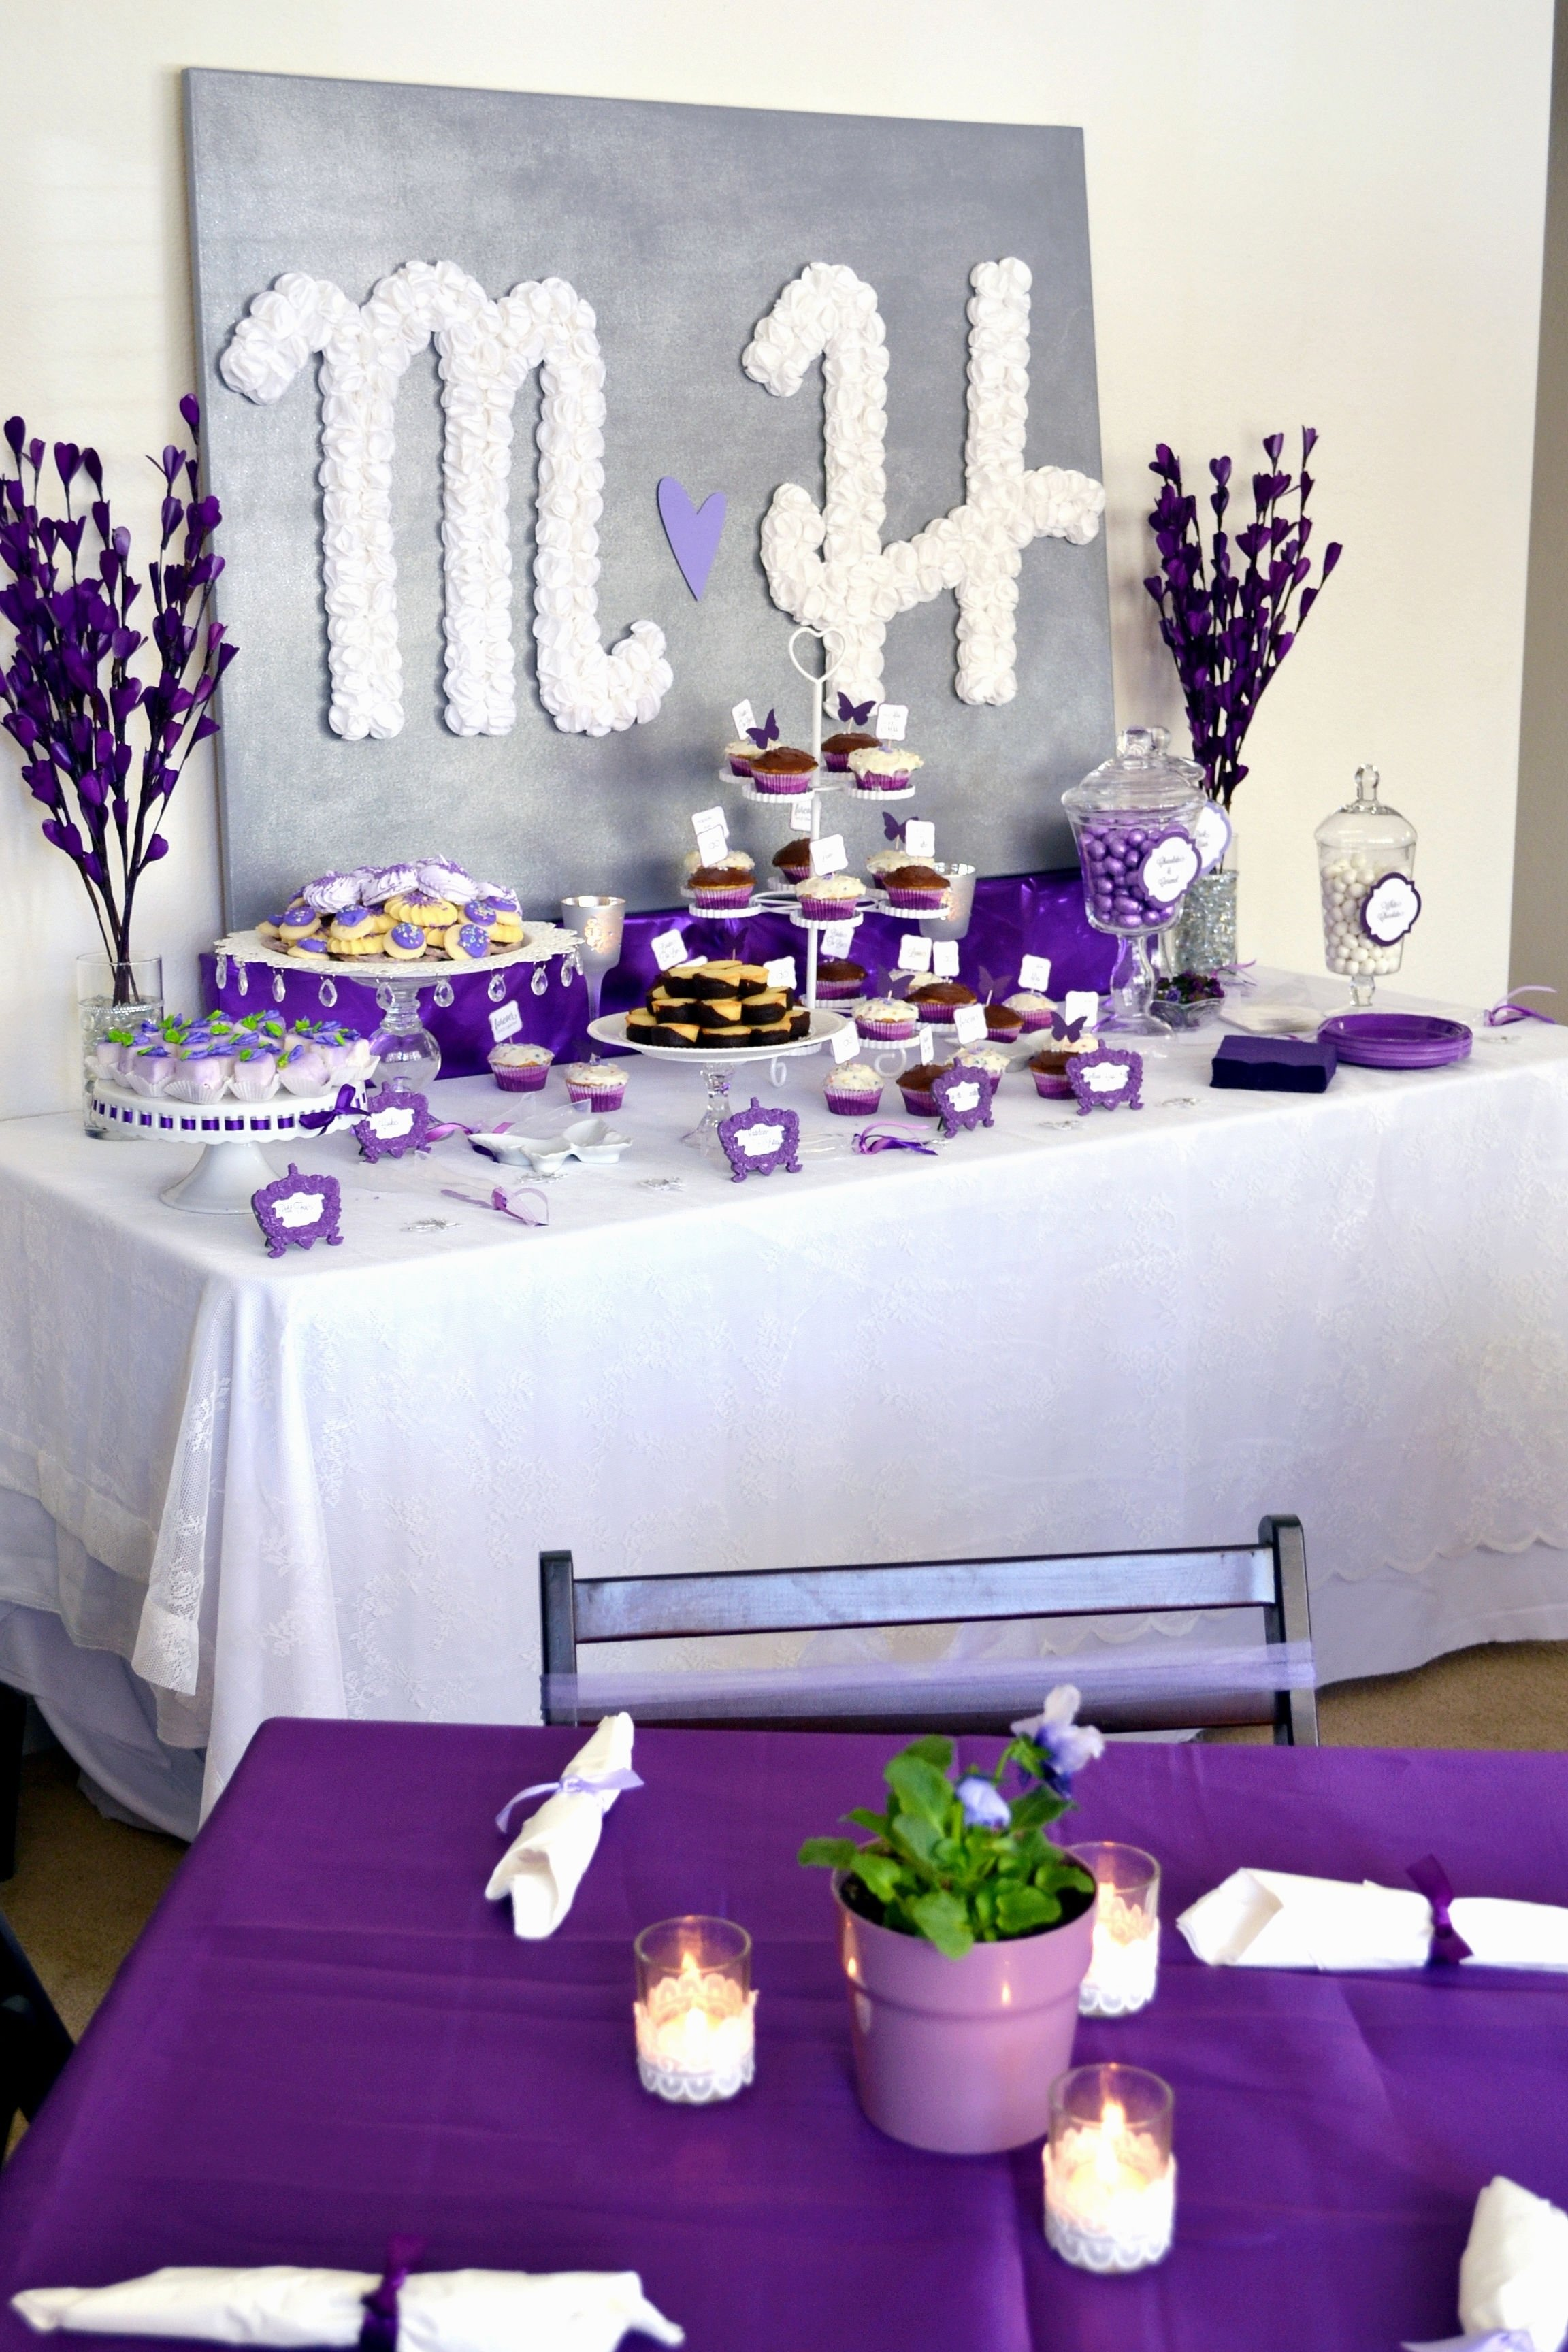 10 Most Popular Bridal Shower Decoration Ideas Homemade diy wedding shower decorations reception decoration ideas 2018 2020